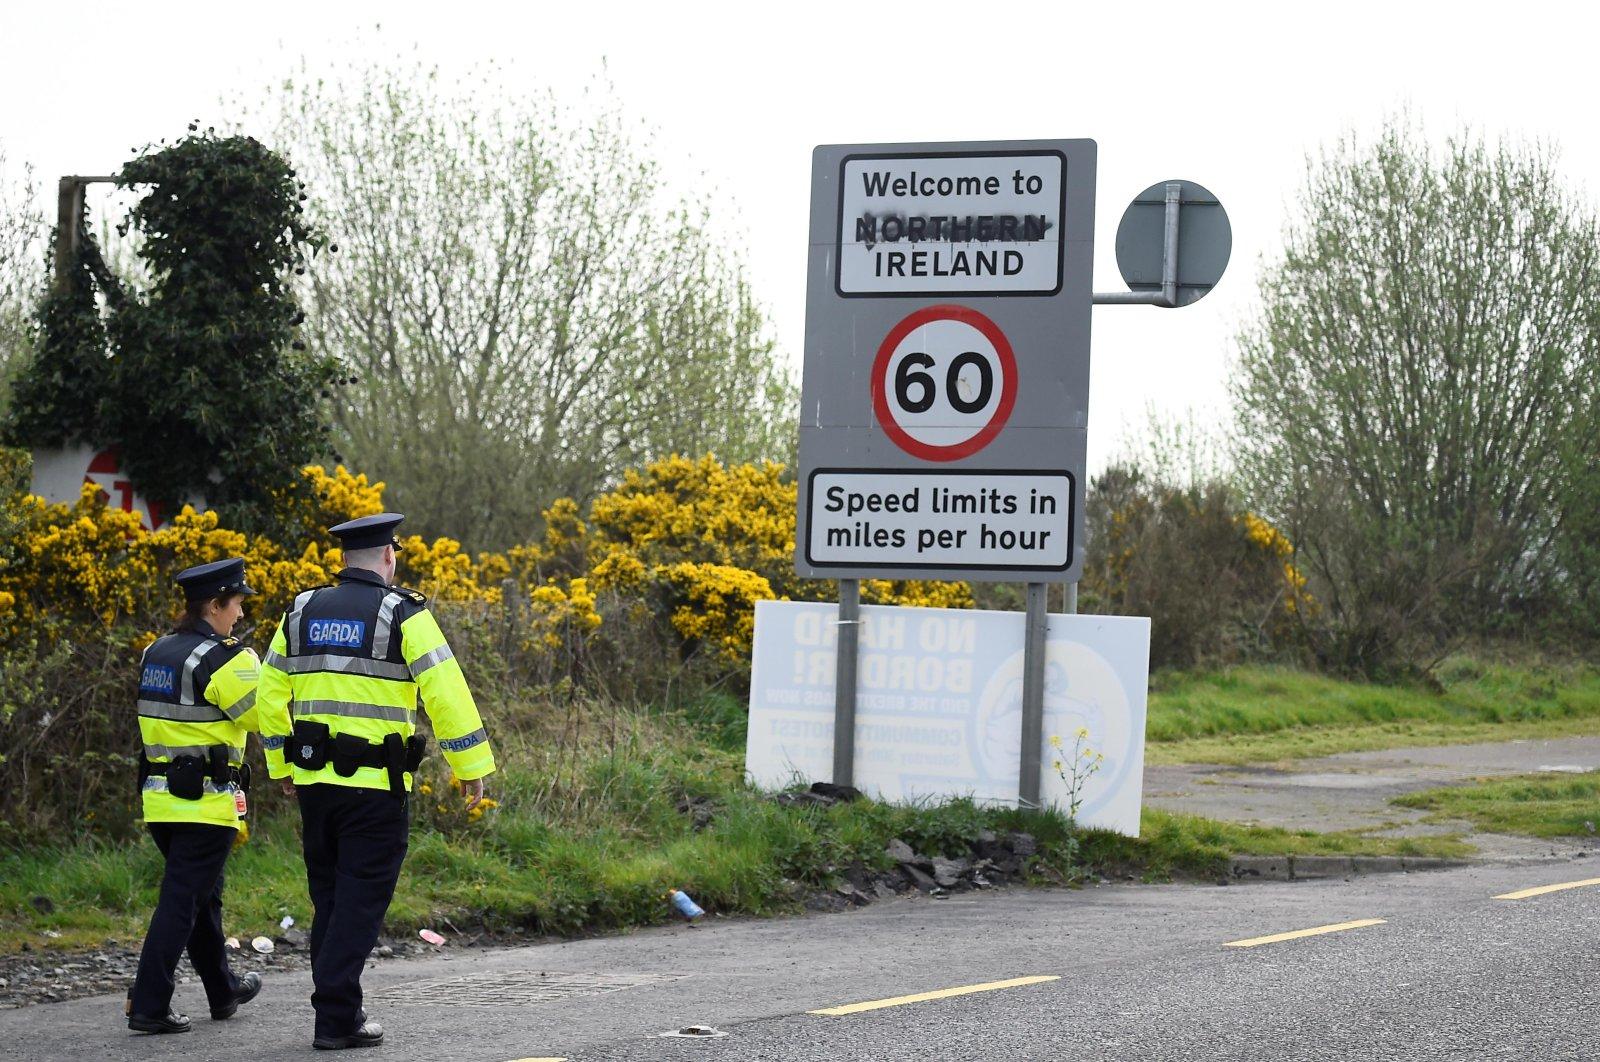 Irish police officers patrol before U.S. House Speaker Nancy Pelosi's visit to the border between Ireland and Northern Ireland in Bridgend, Ireland, April 18, 2019. (Reuters Photo)